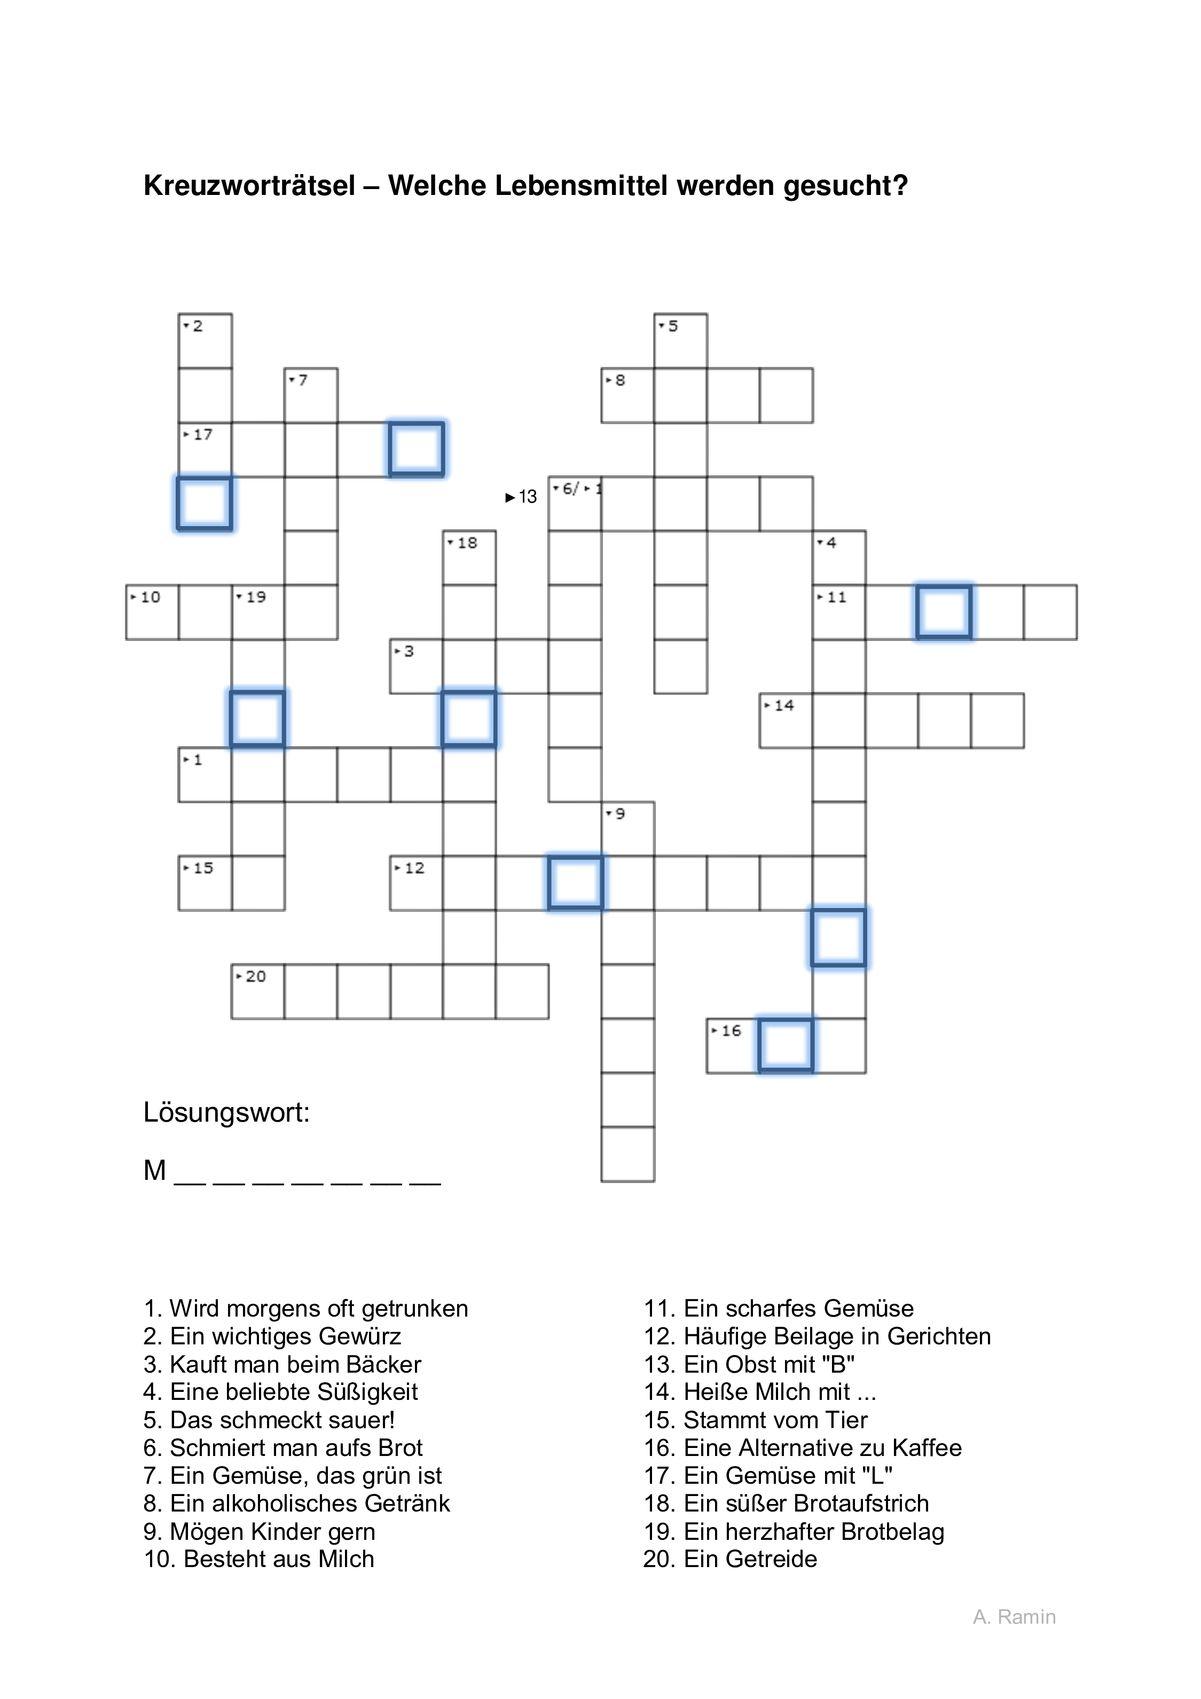 Alle Kreuzworträtsel